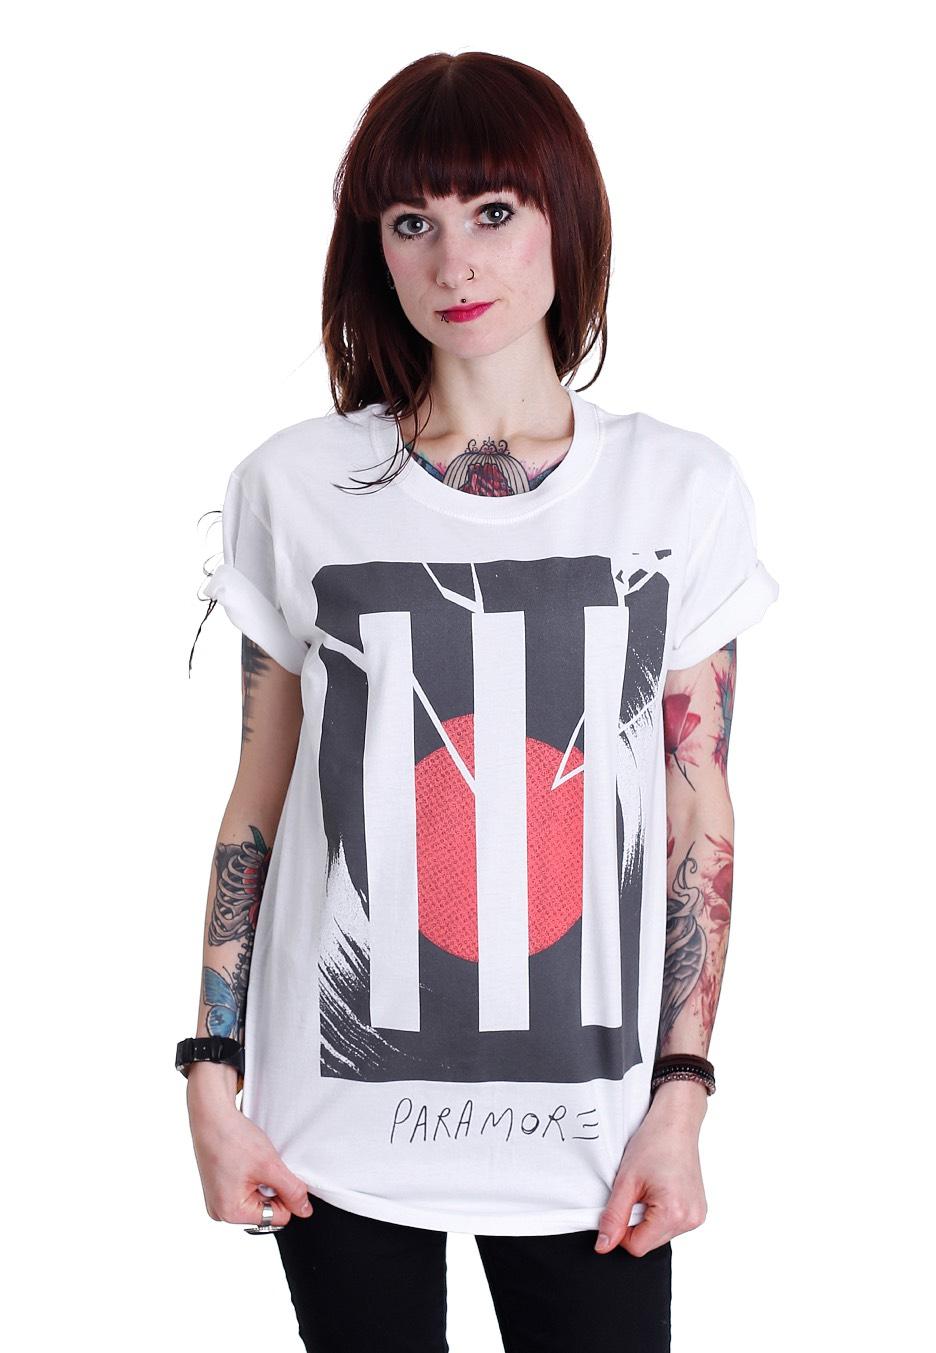 Paramore - Broken Record Bars White - T-Shirt - Official ... Paramore Nederland